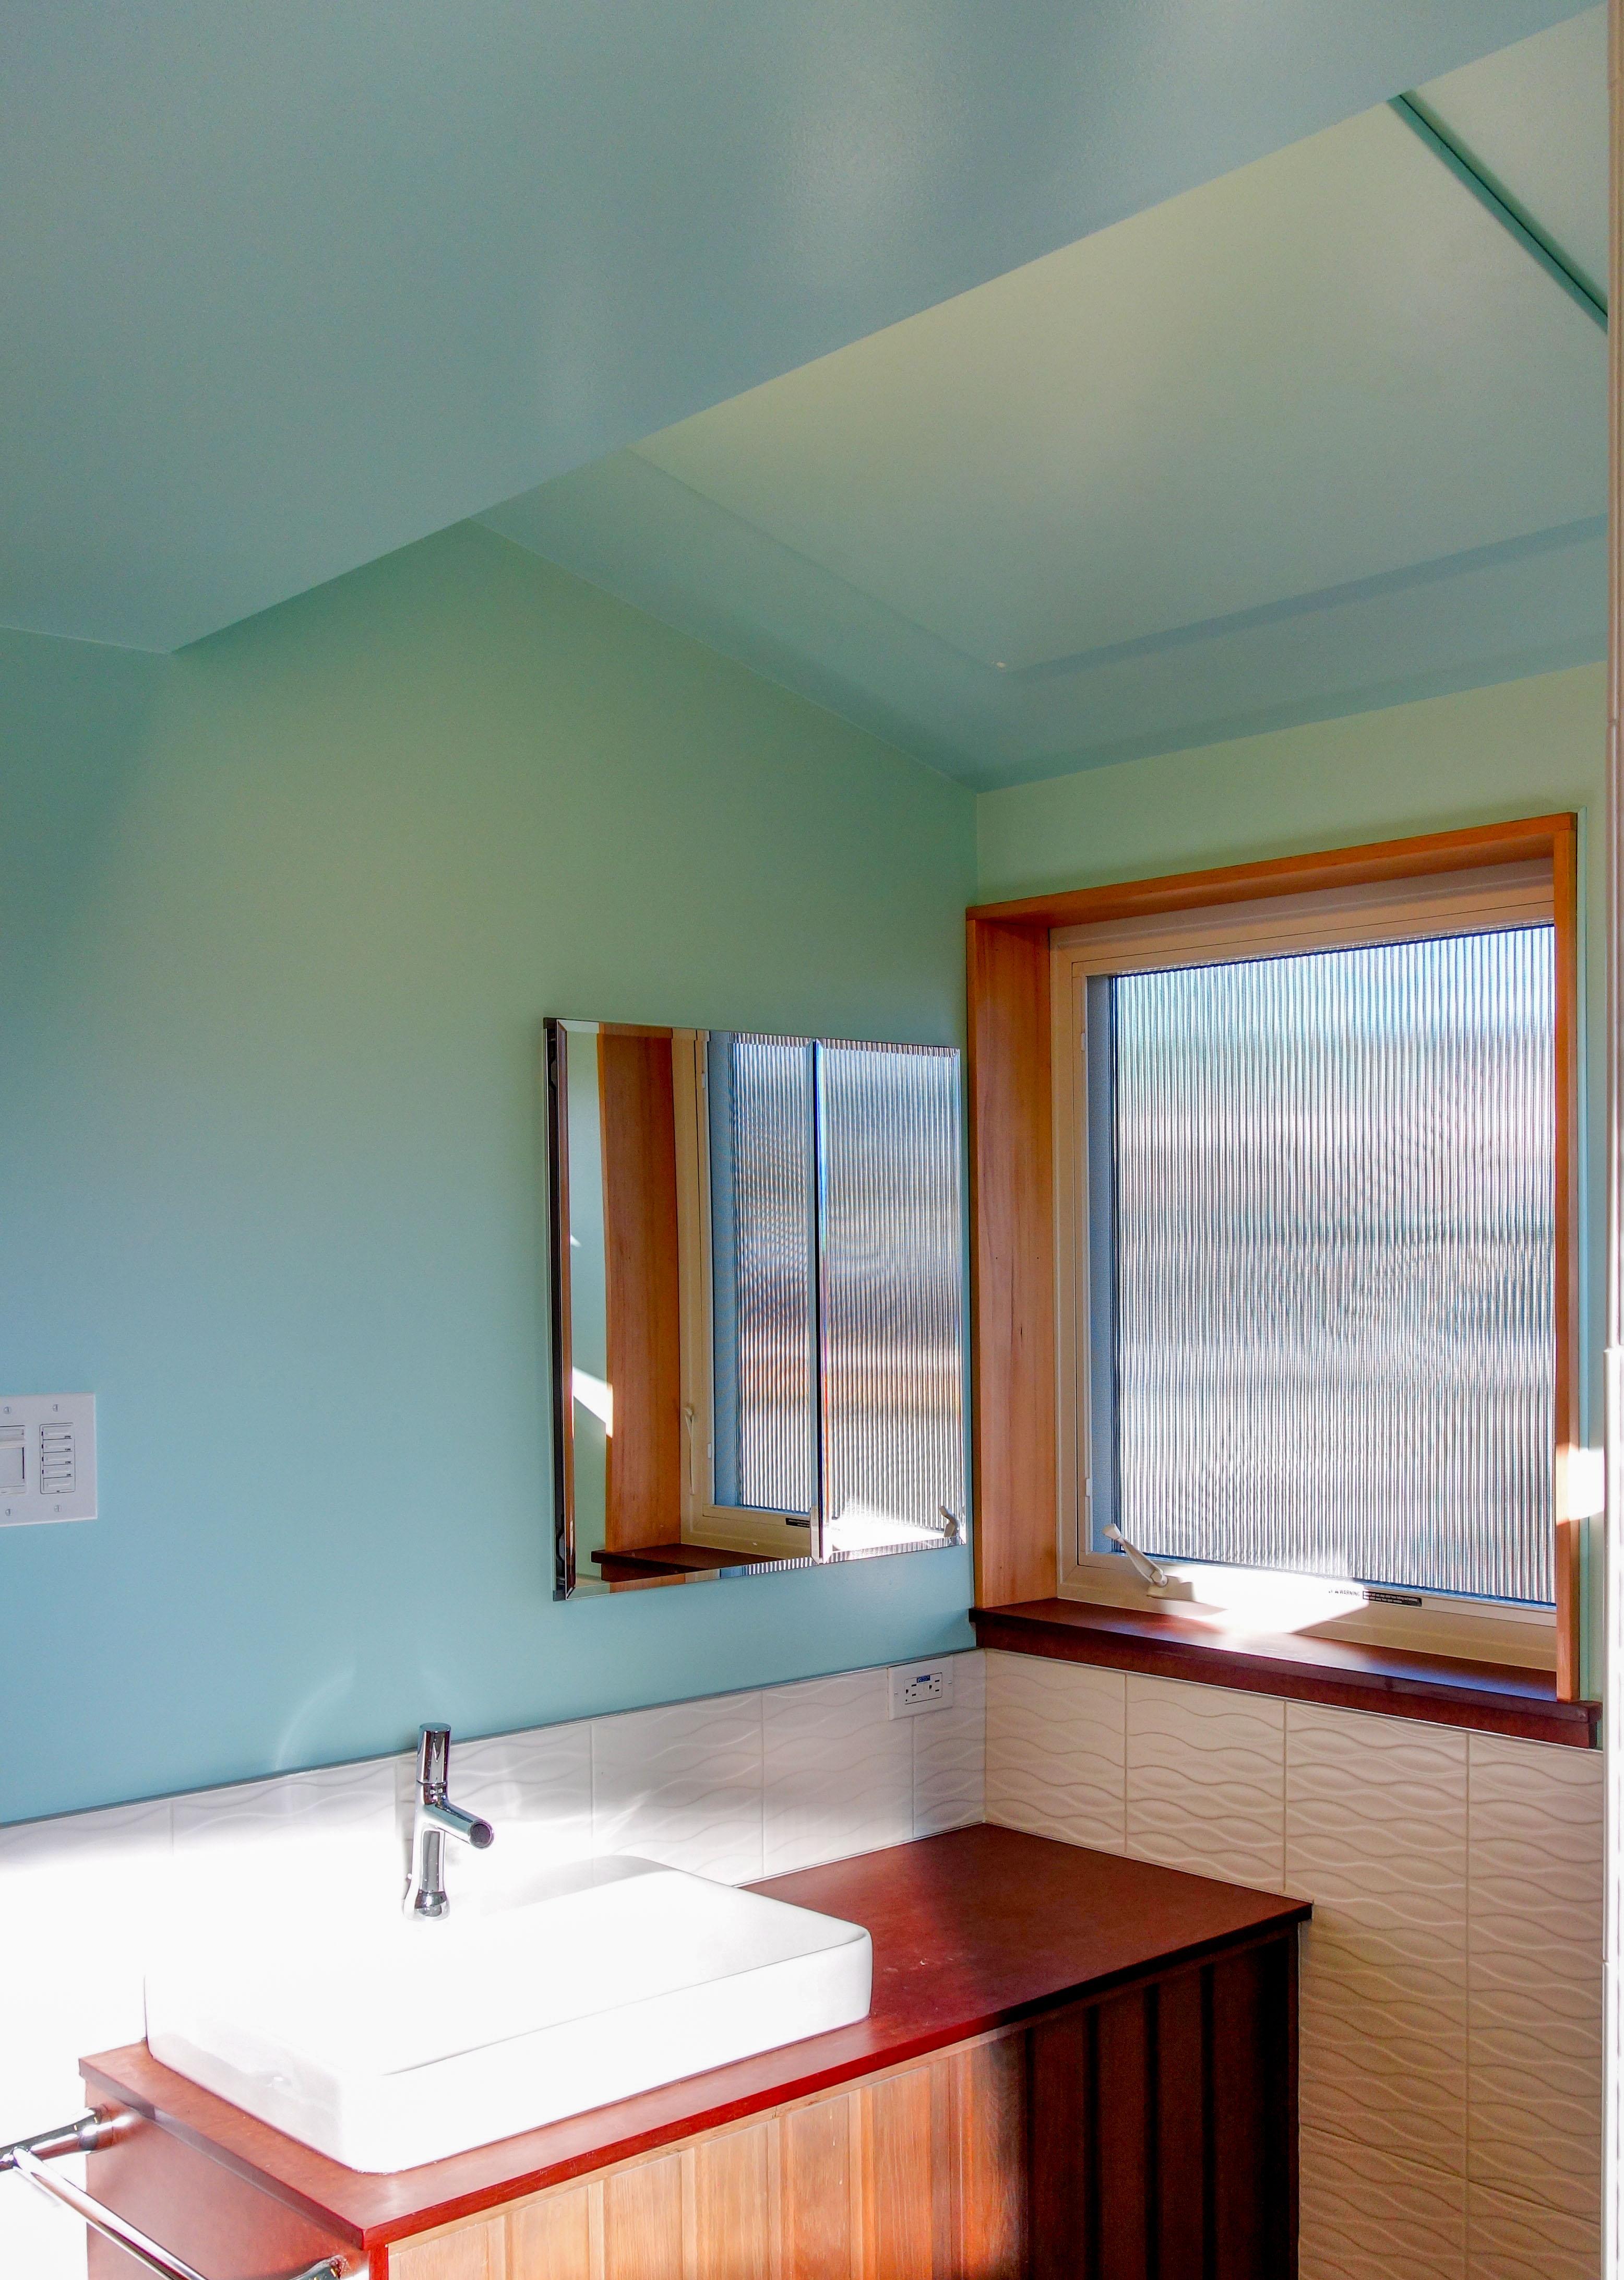 SolaRay Far Infrared Panel in a Bathroom